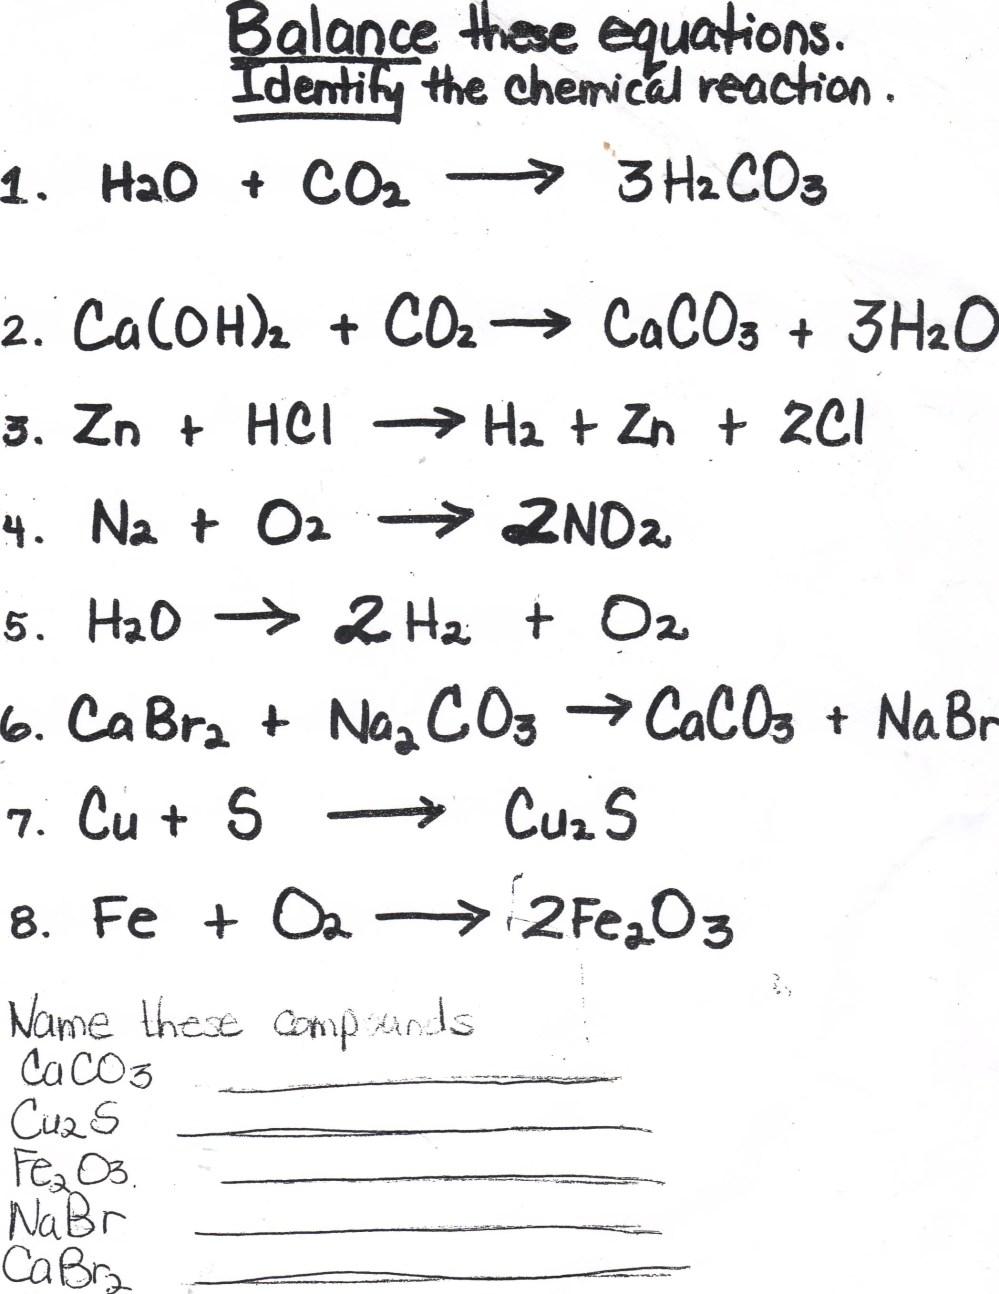 medium resolution of Balancing Chemical Equations Homework Help; Balancing chemical equations  homework help